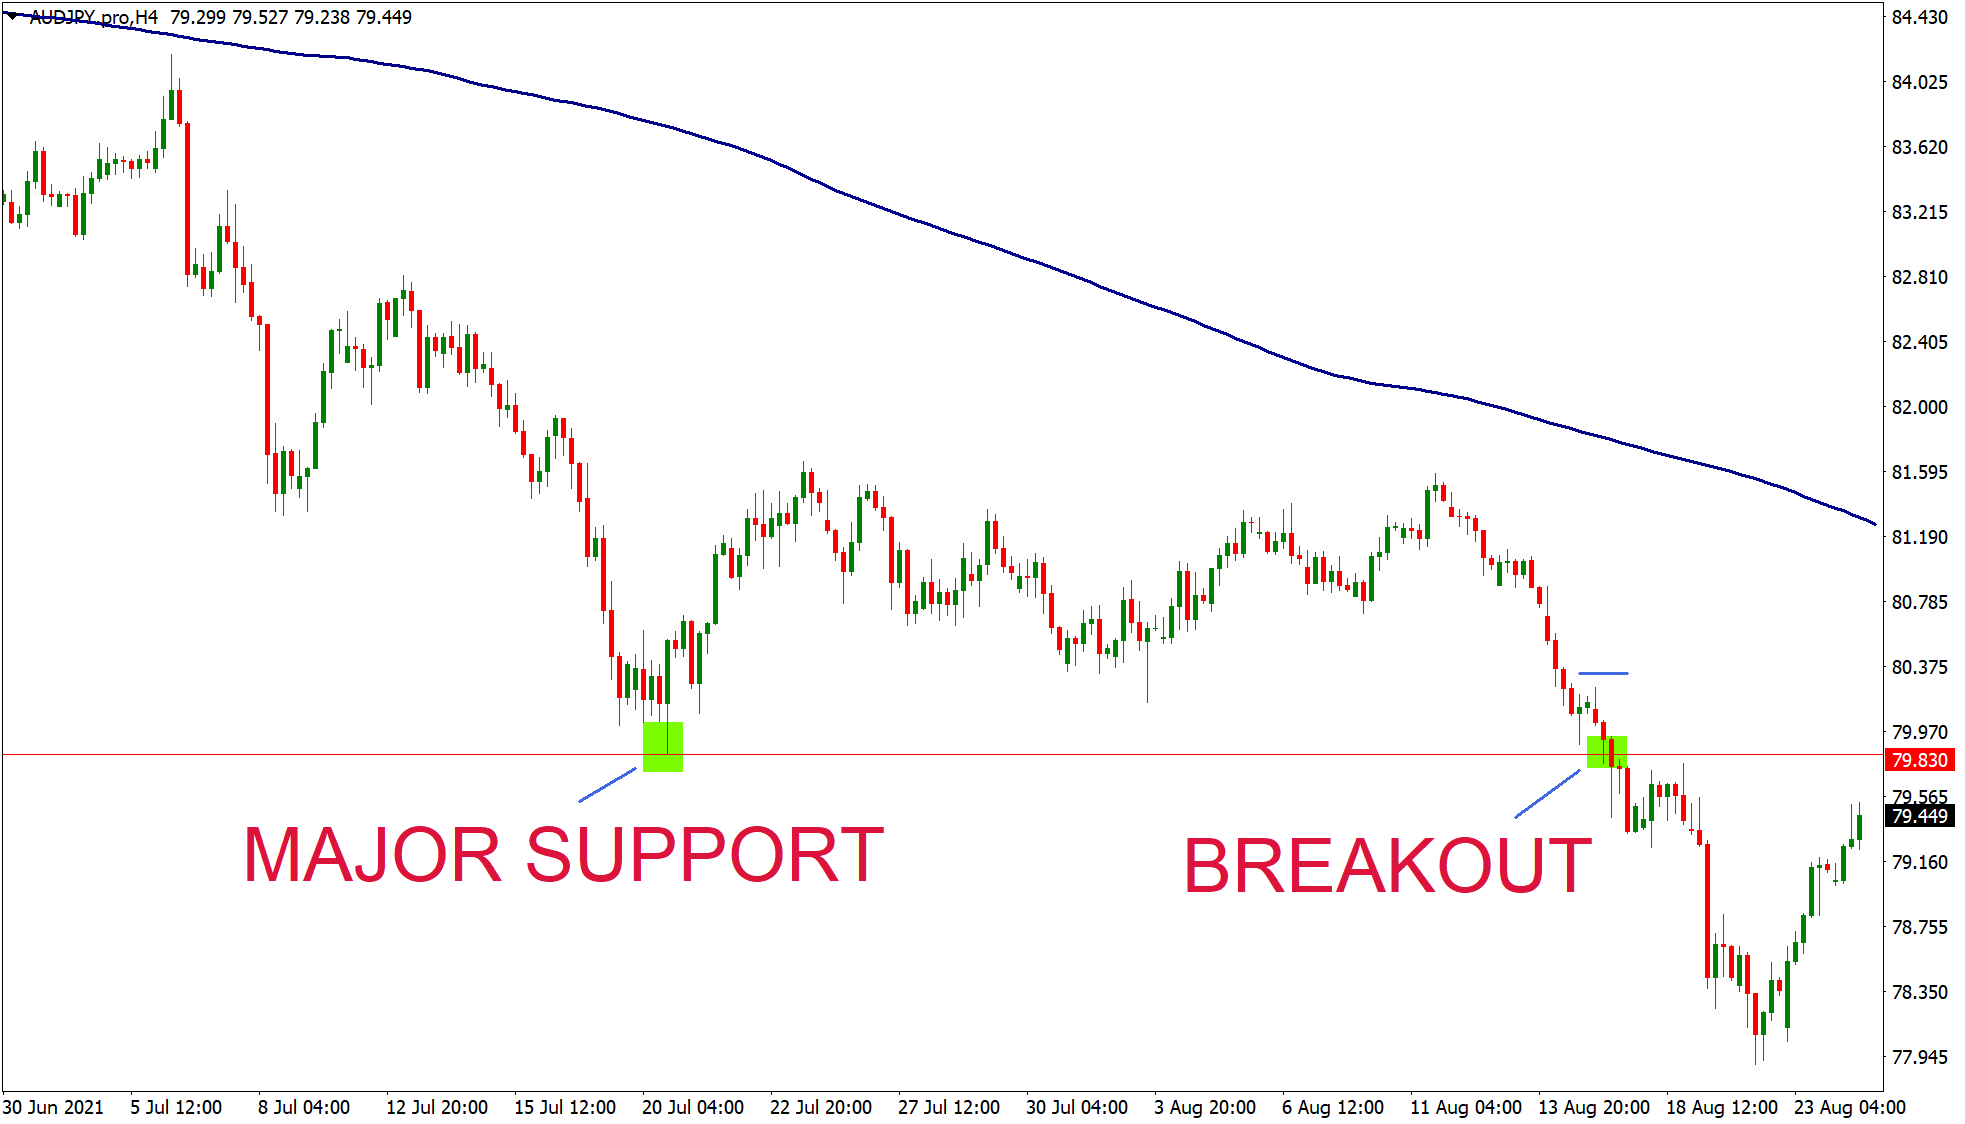 AUDJPY breakout strategy opportunity on trading chart